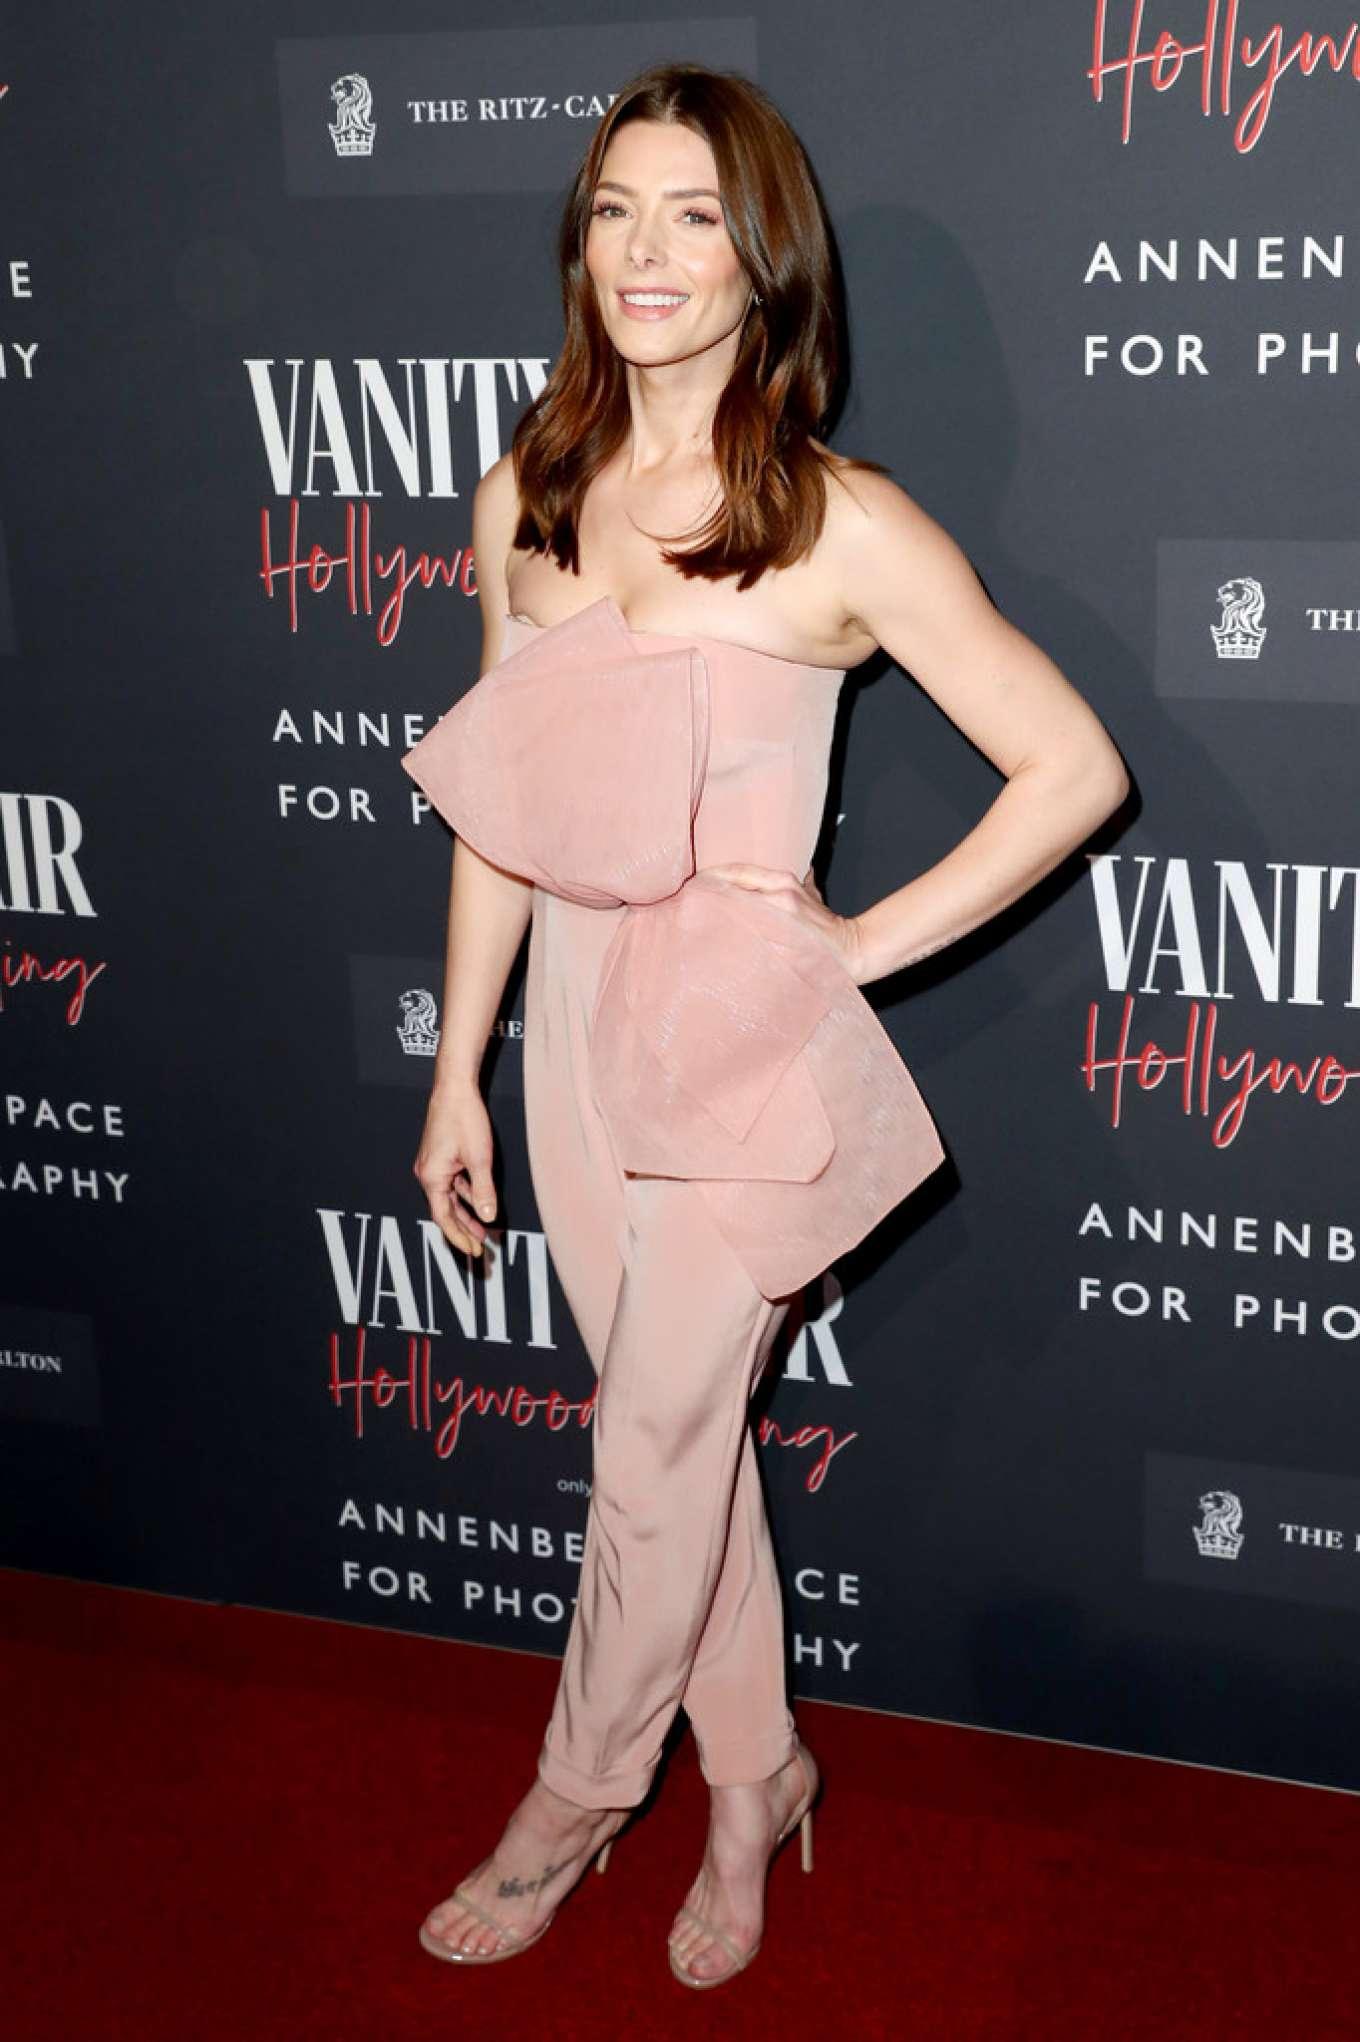 Ashley Greene 2020 : Ashley Greene – Vanity Fair: Hollywood Calling Opening in Century City-07